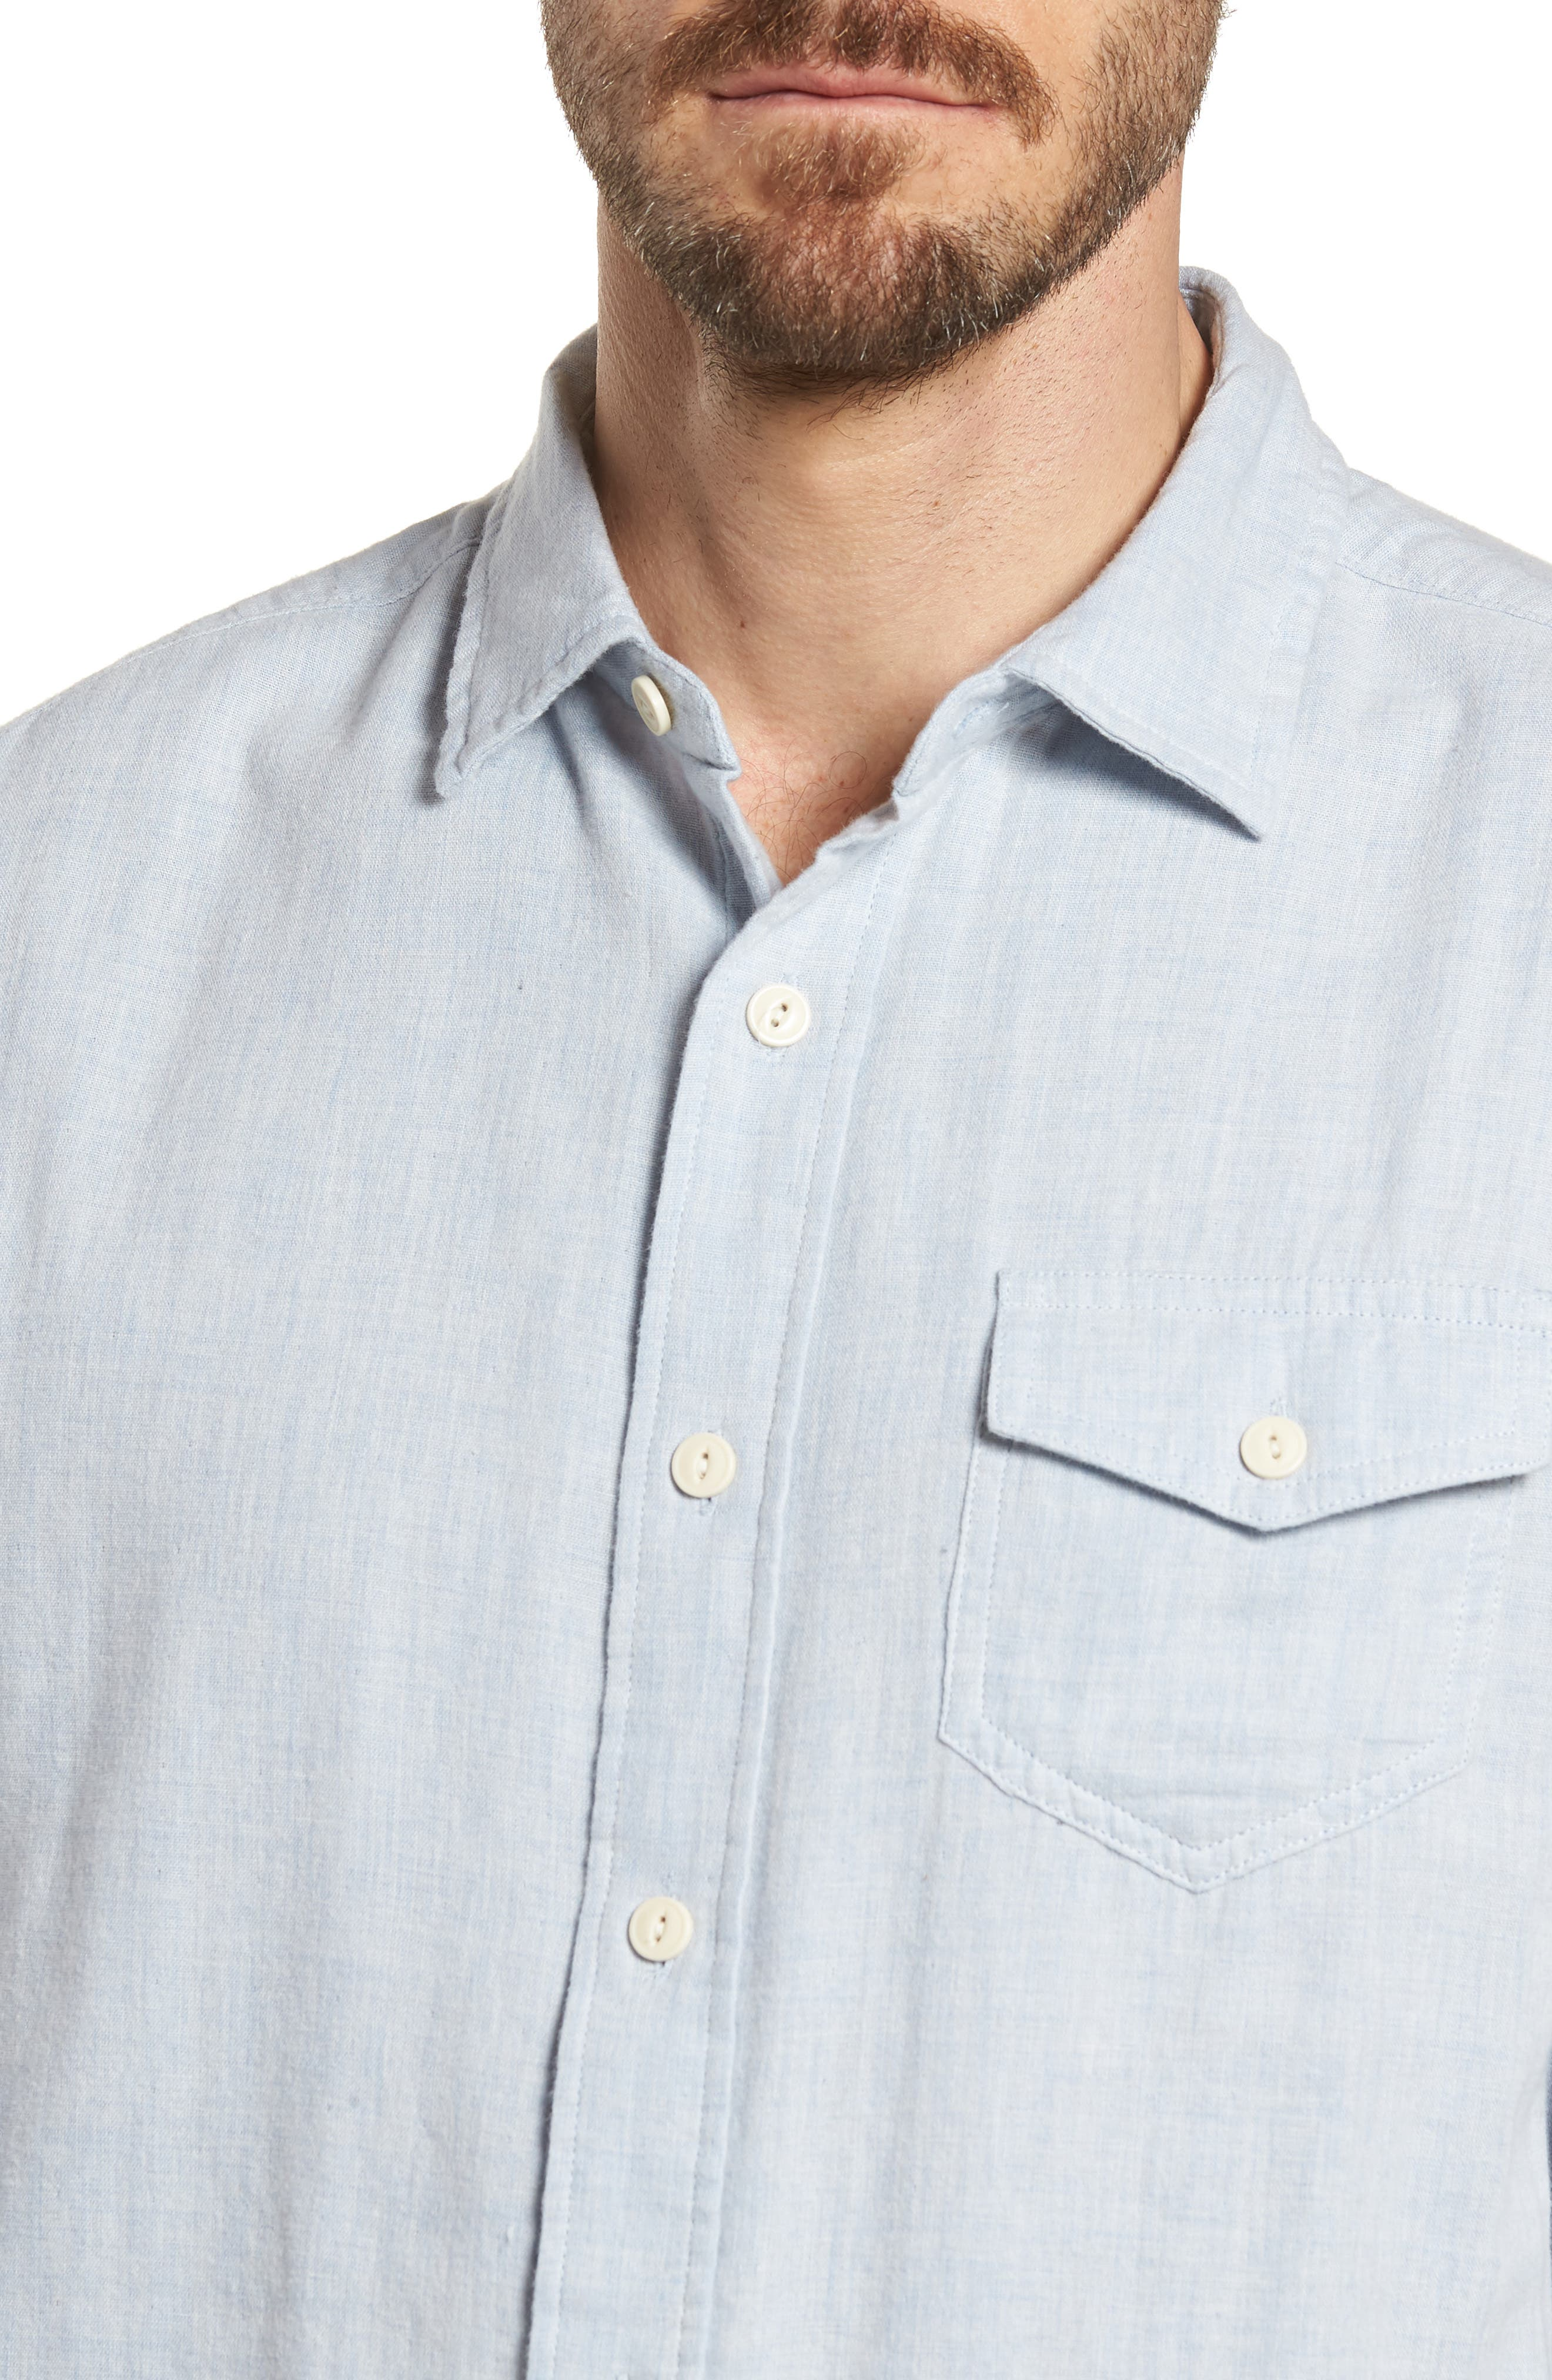 Hammond Slim Fit Sport Shirt,                             Alternate thumbnail 4, color,                             Light Blue Heather